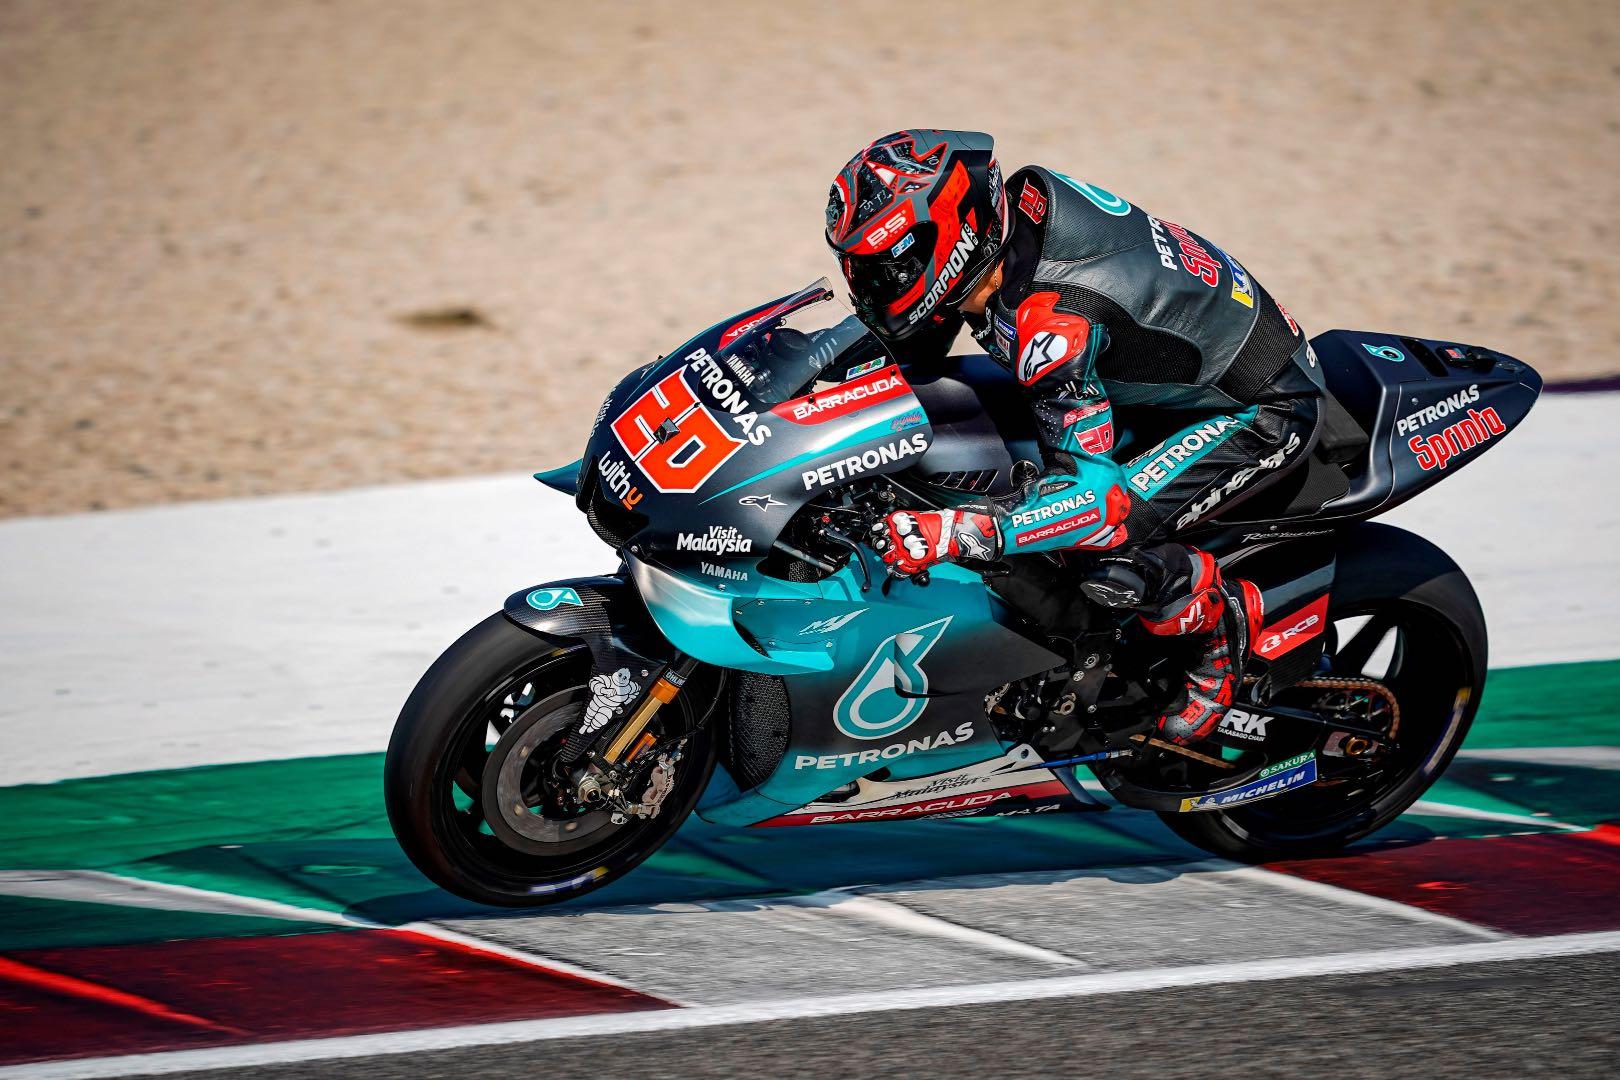 Yamaha's Quartararo Dominates 2-Day Misano MotoGP Test